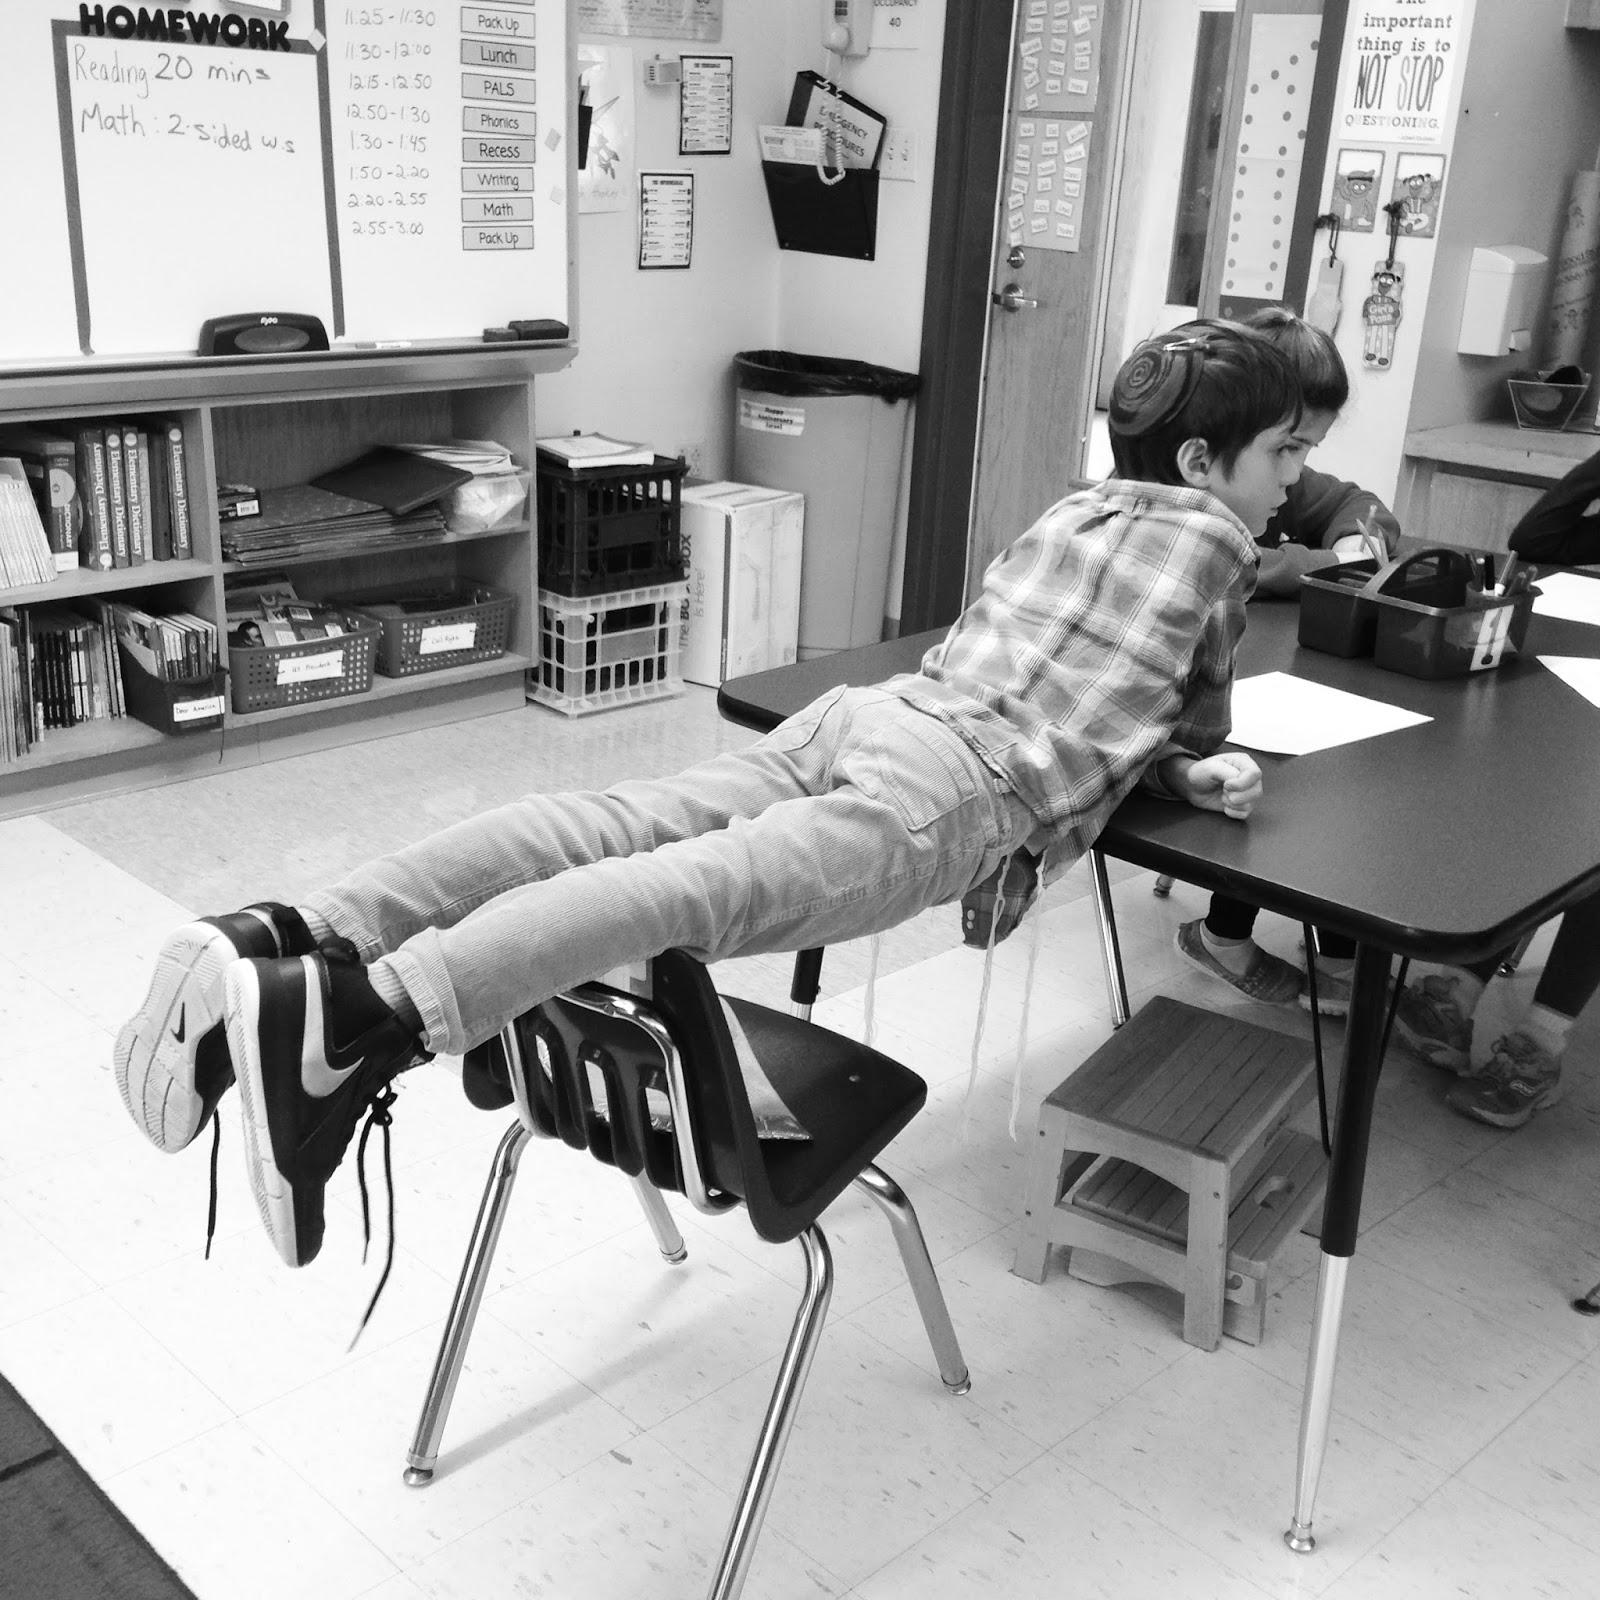 high chair upside down pedicure liners random osity song